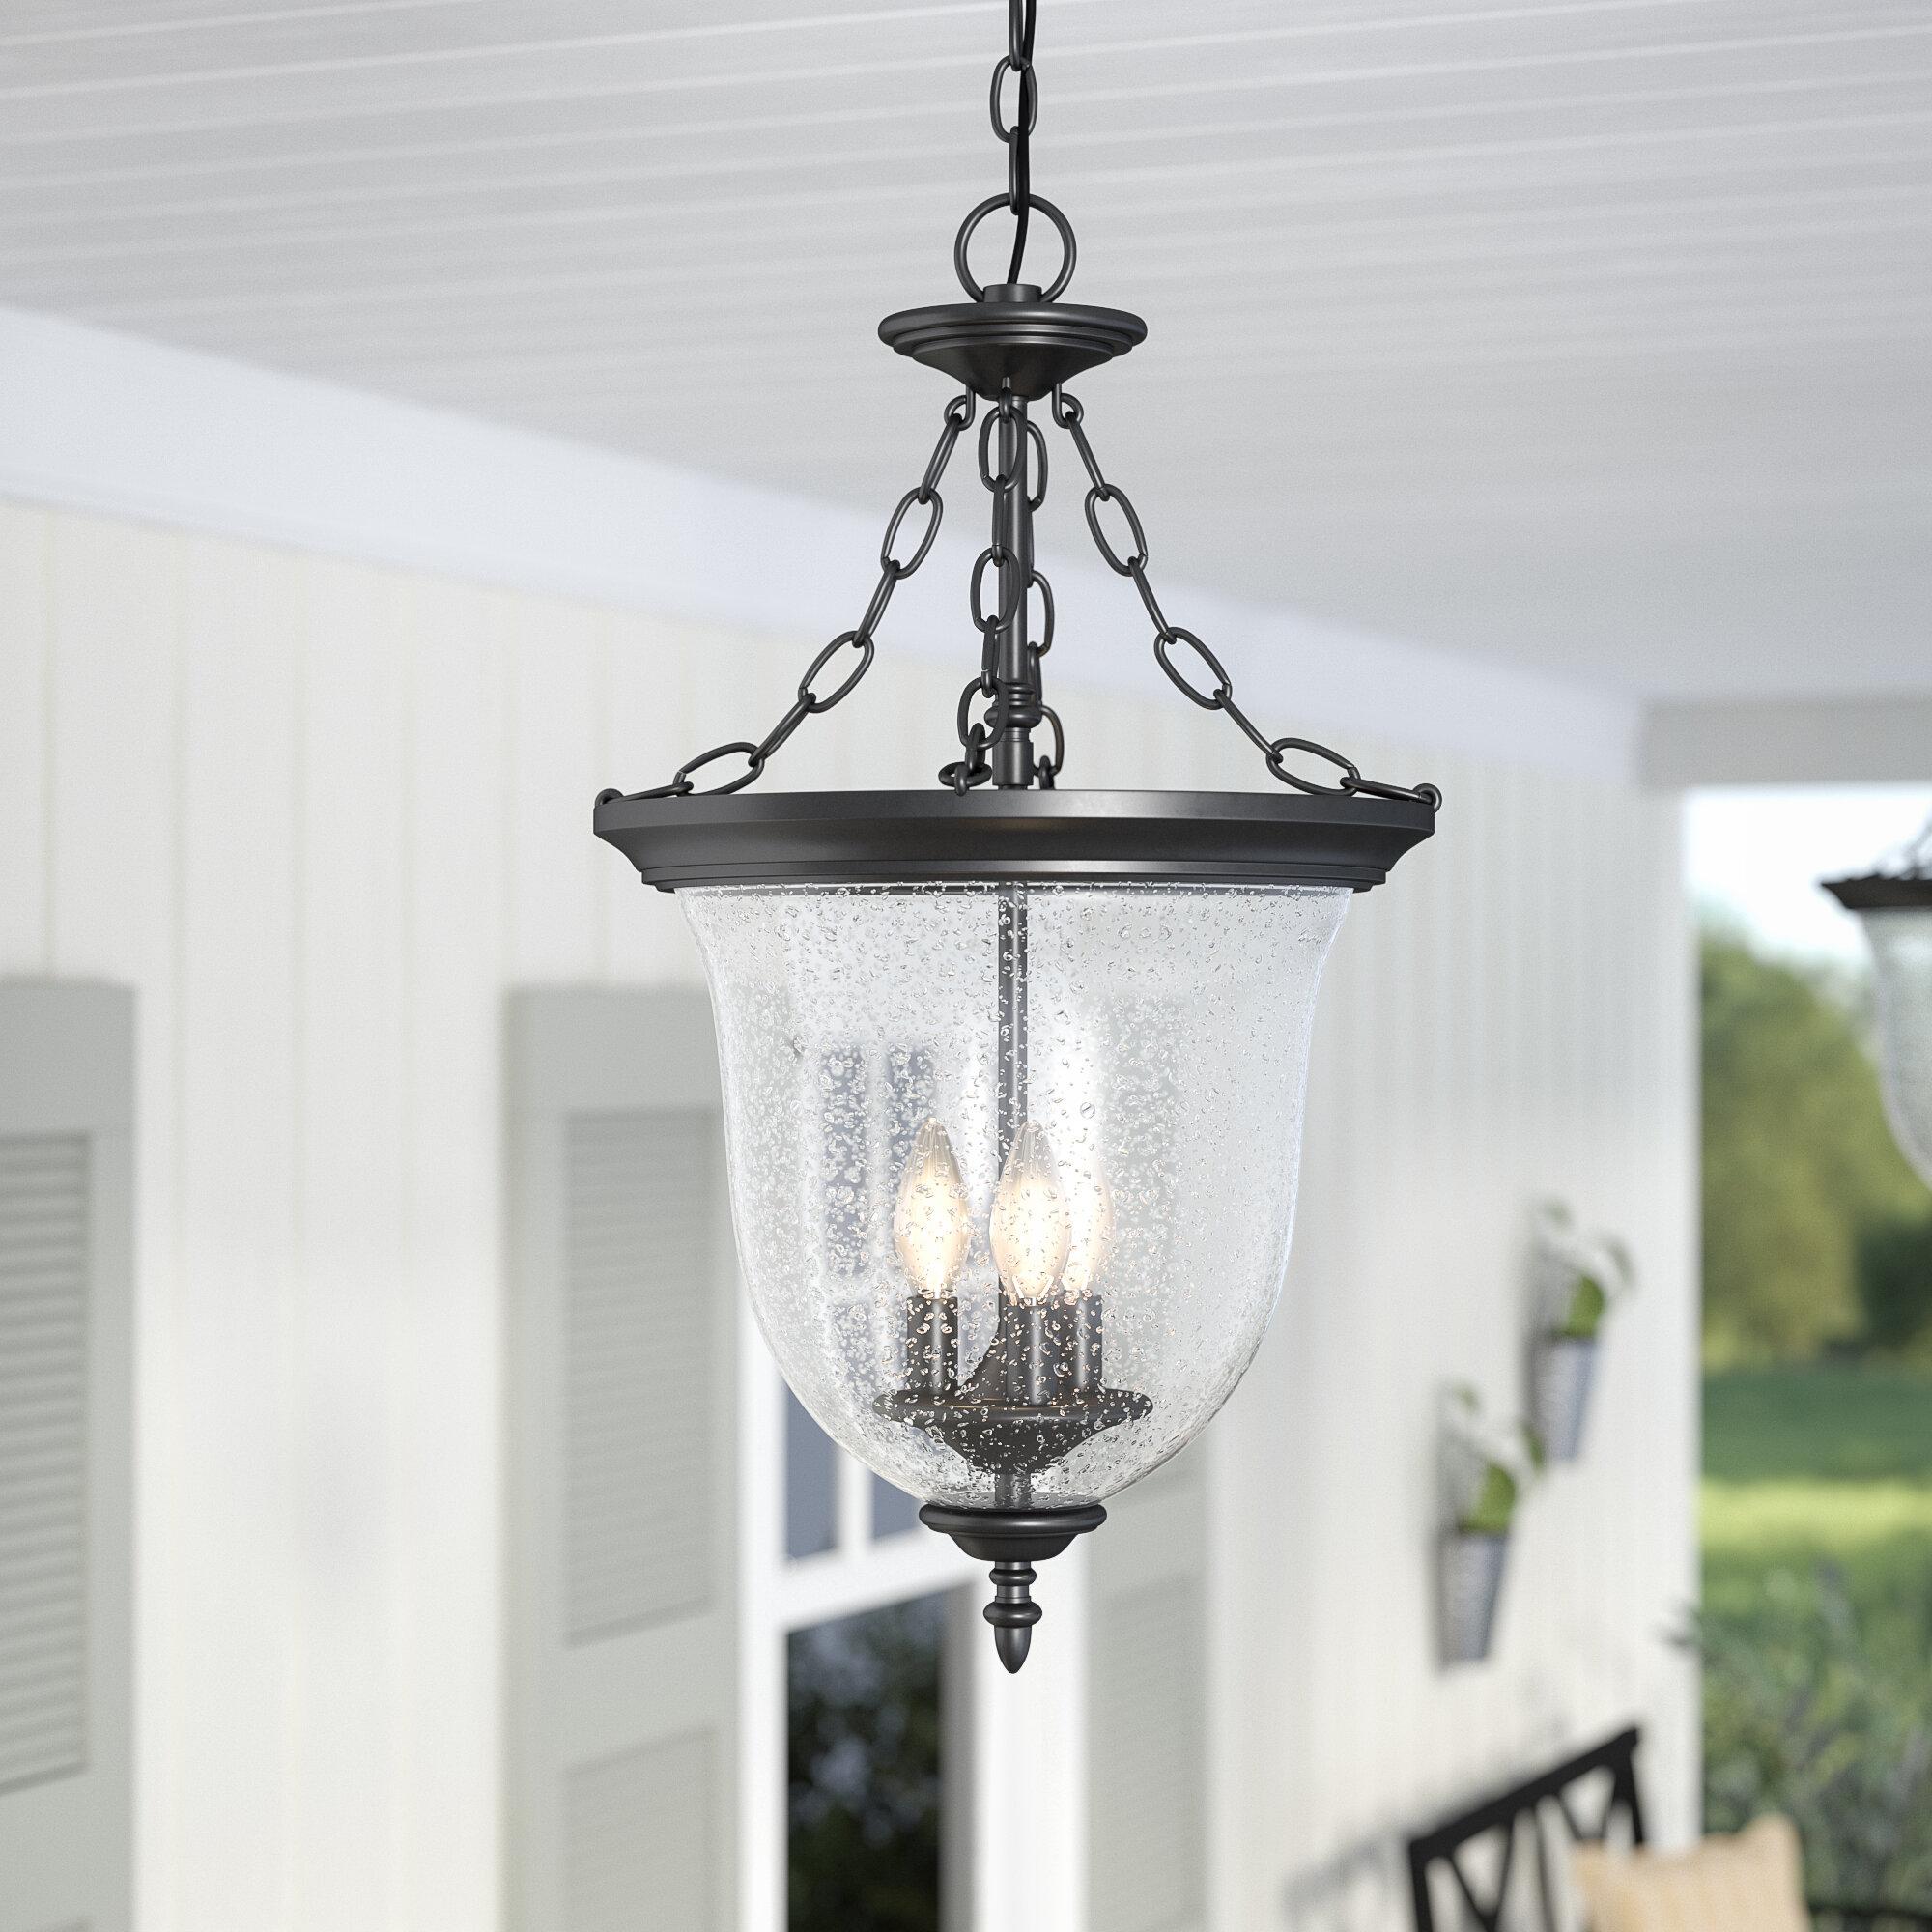 Laurel foundry modern farmhouse maxillaria 3 light outdoor pendant reviews wayfair